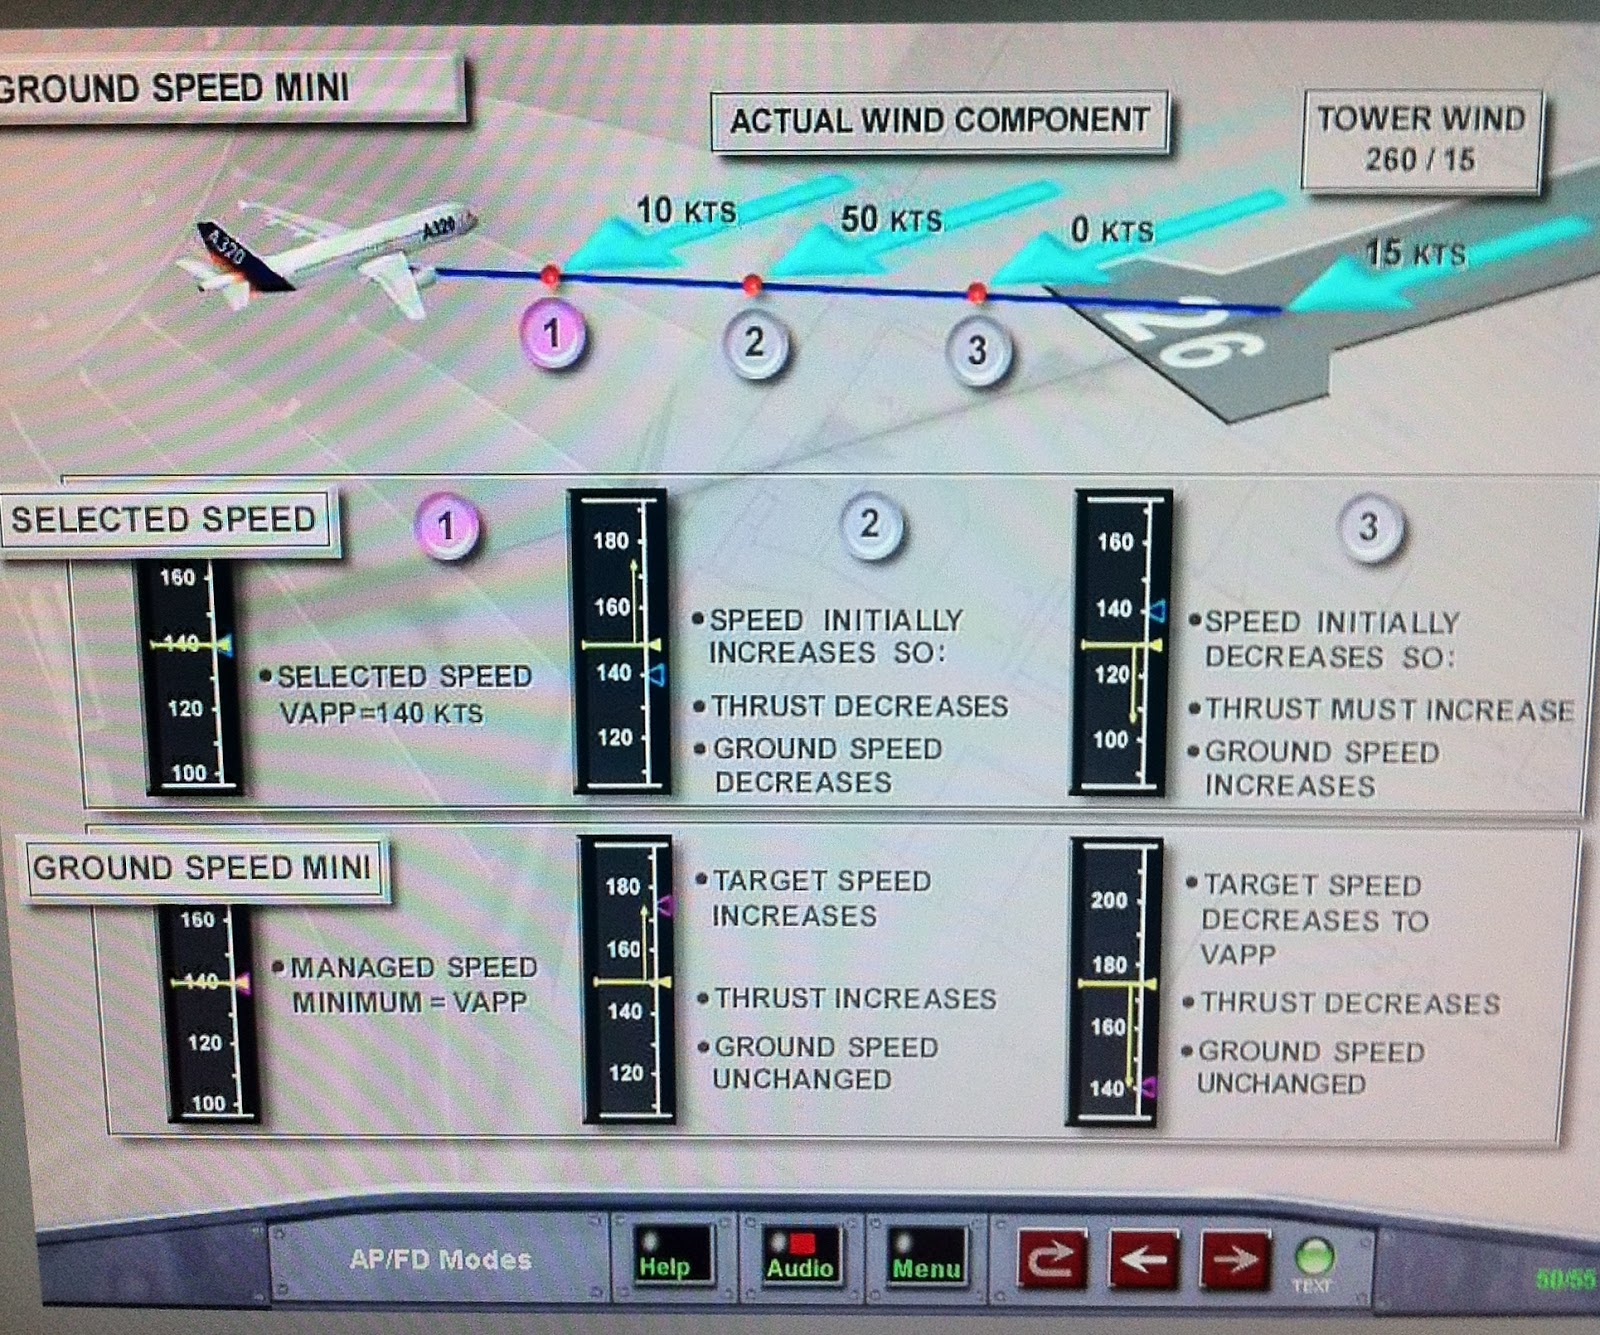 A320 Technical training Manual